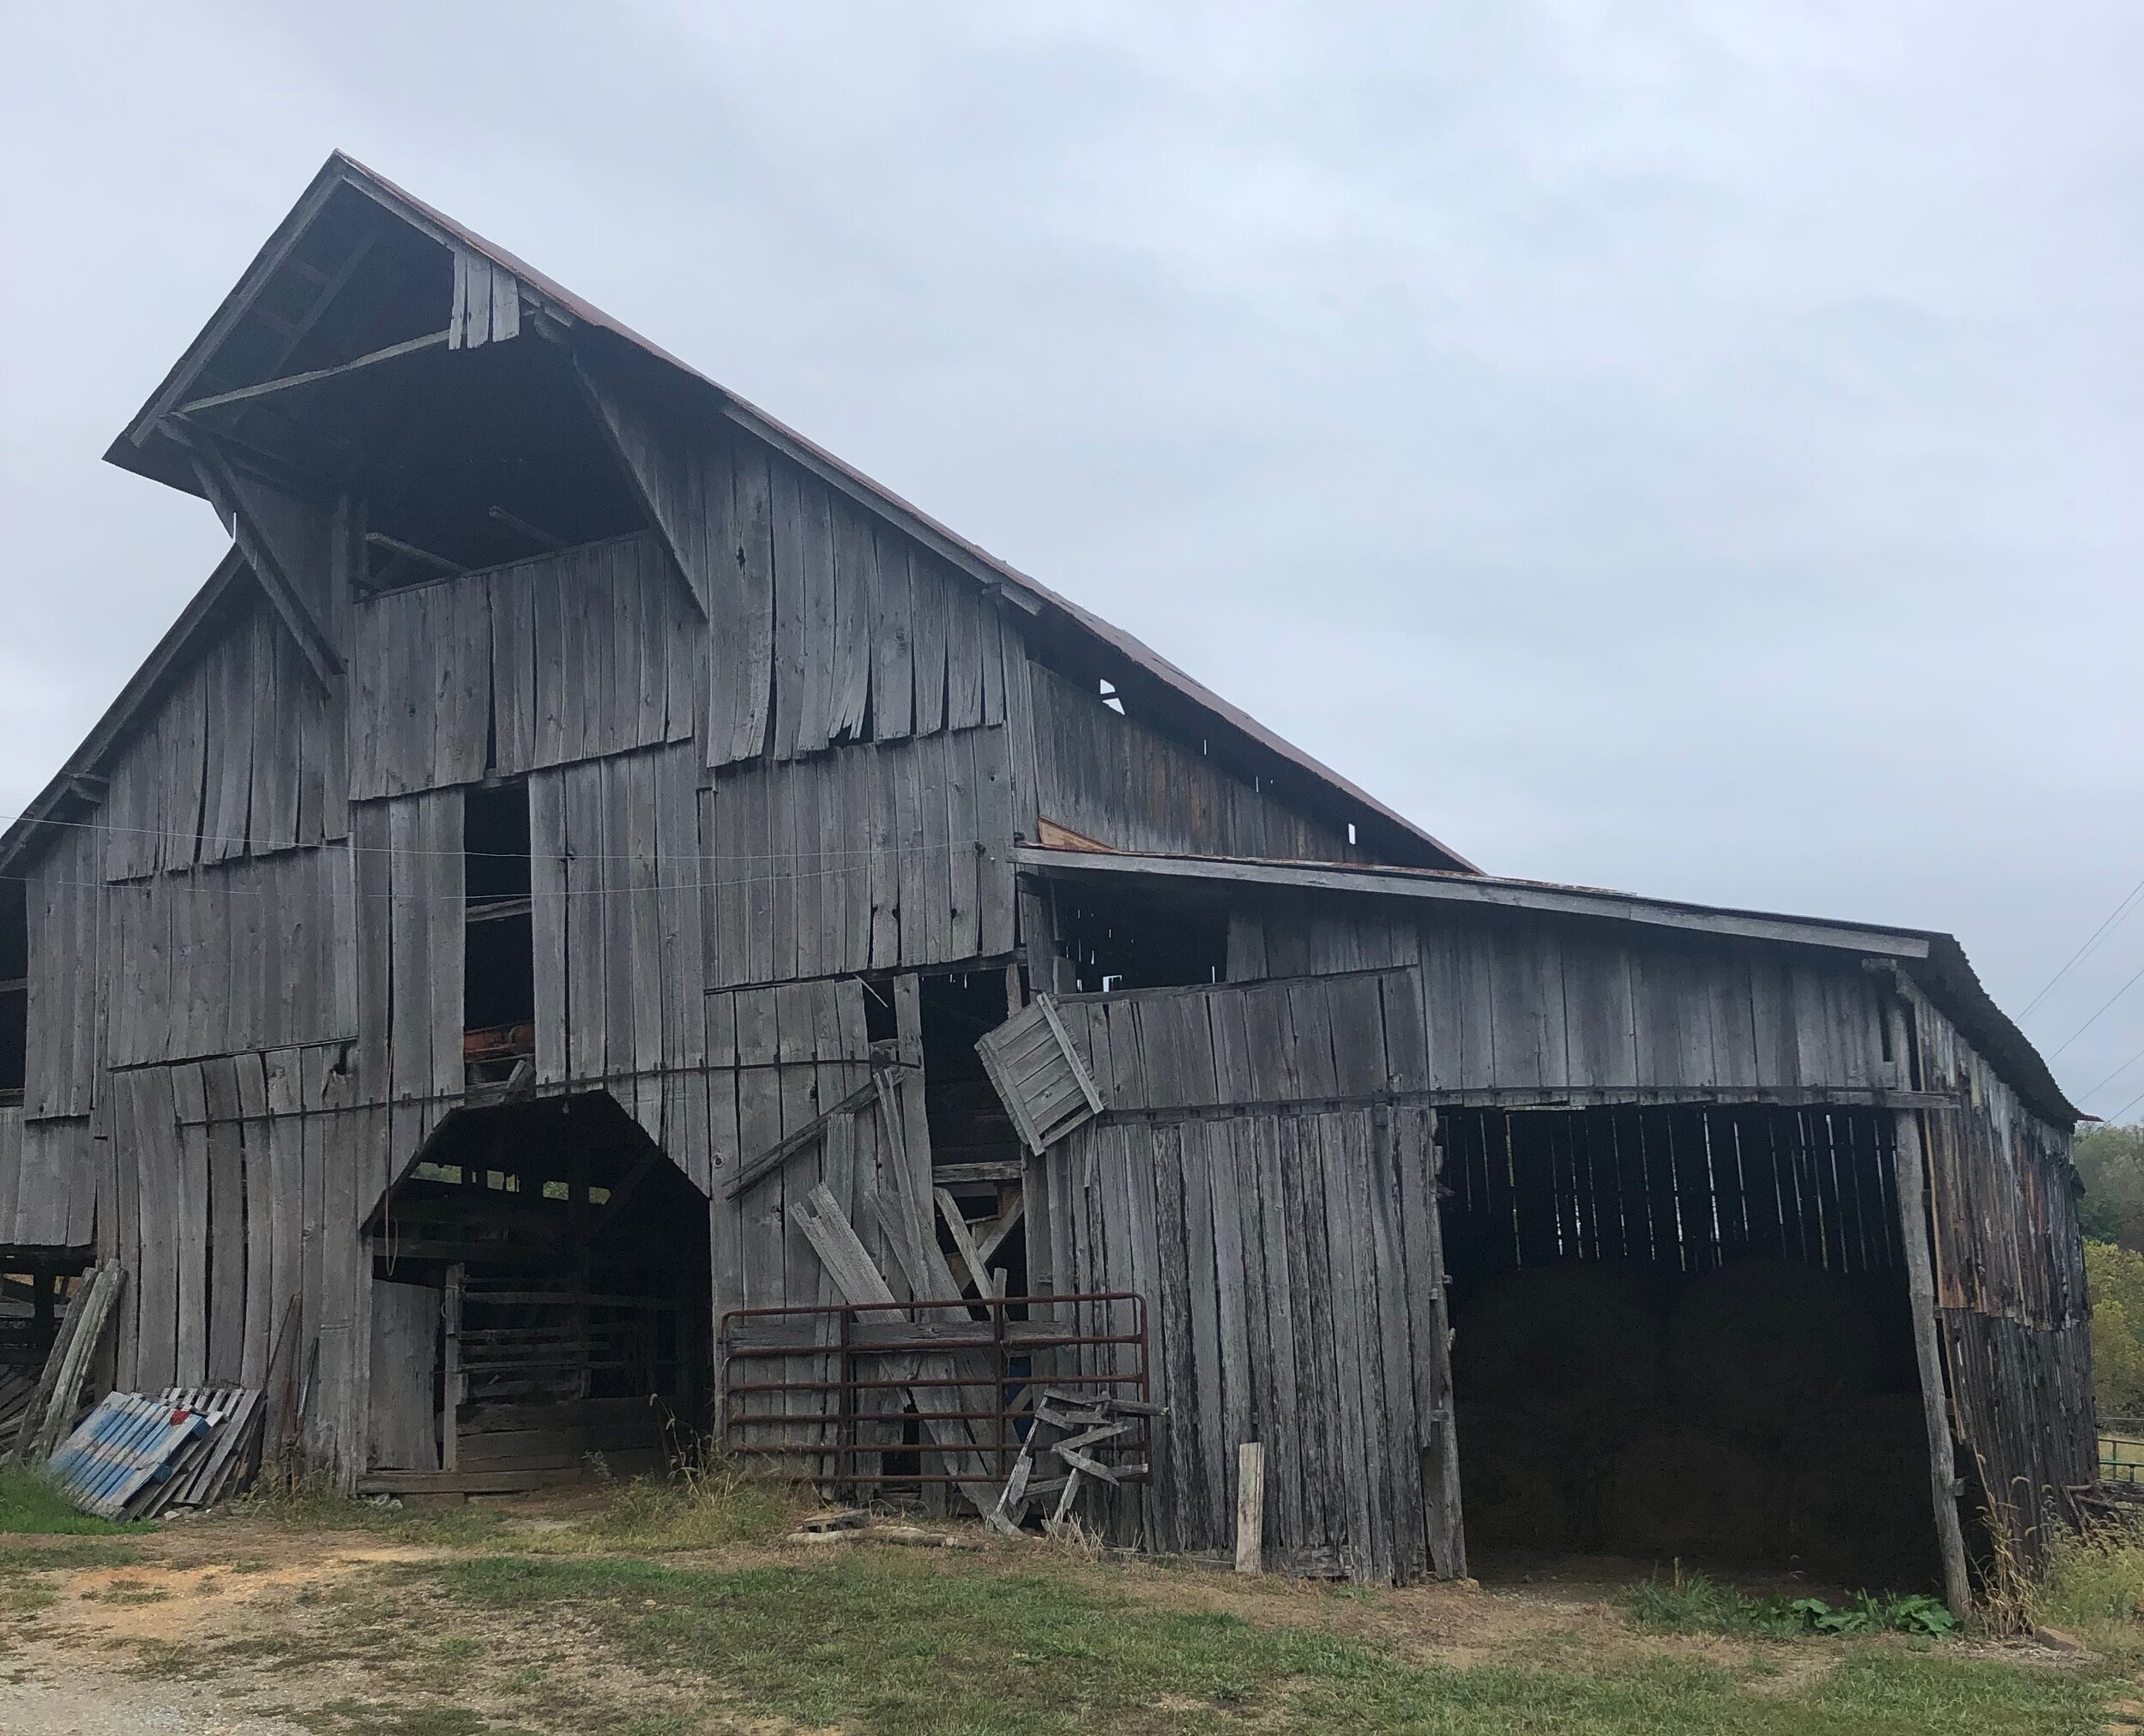 The last Tennessee barn…